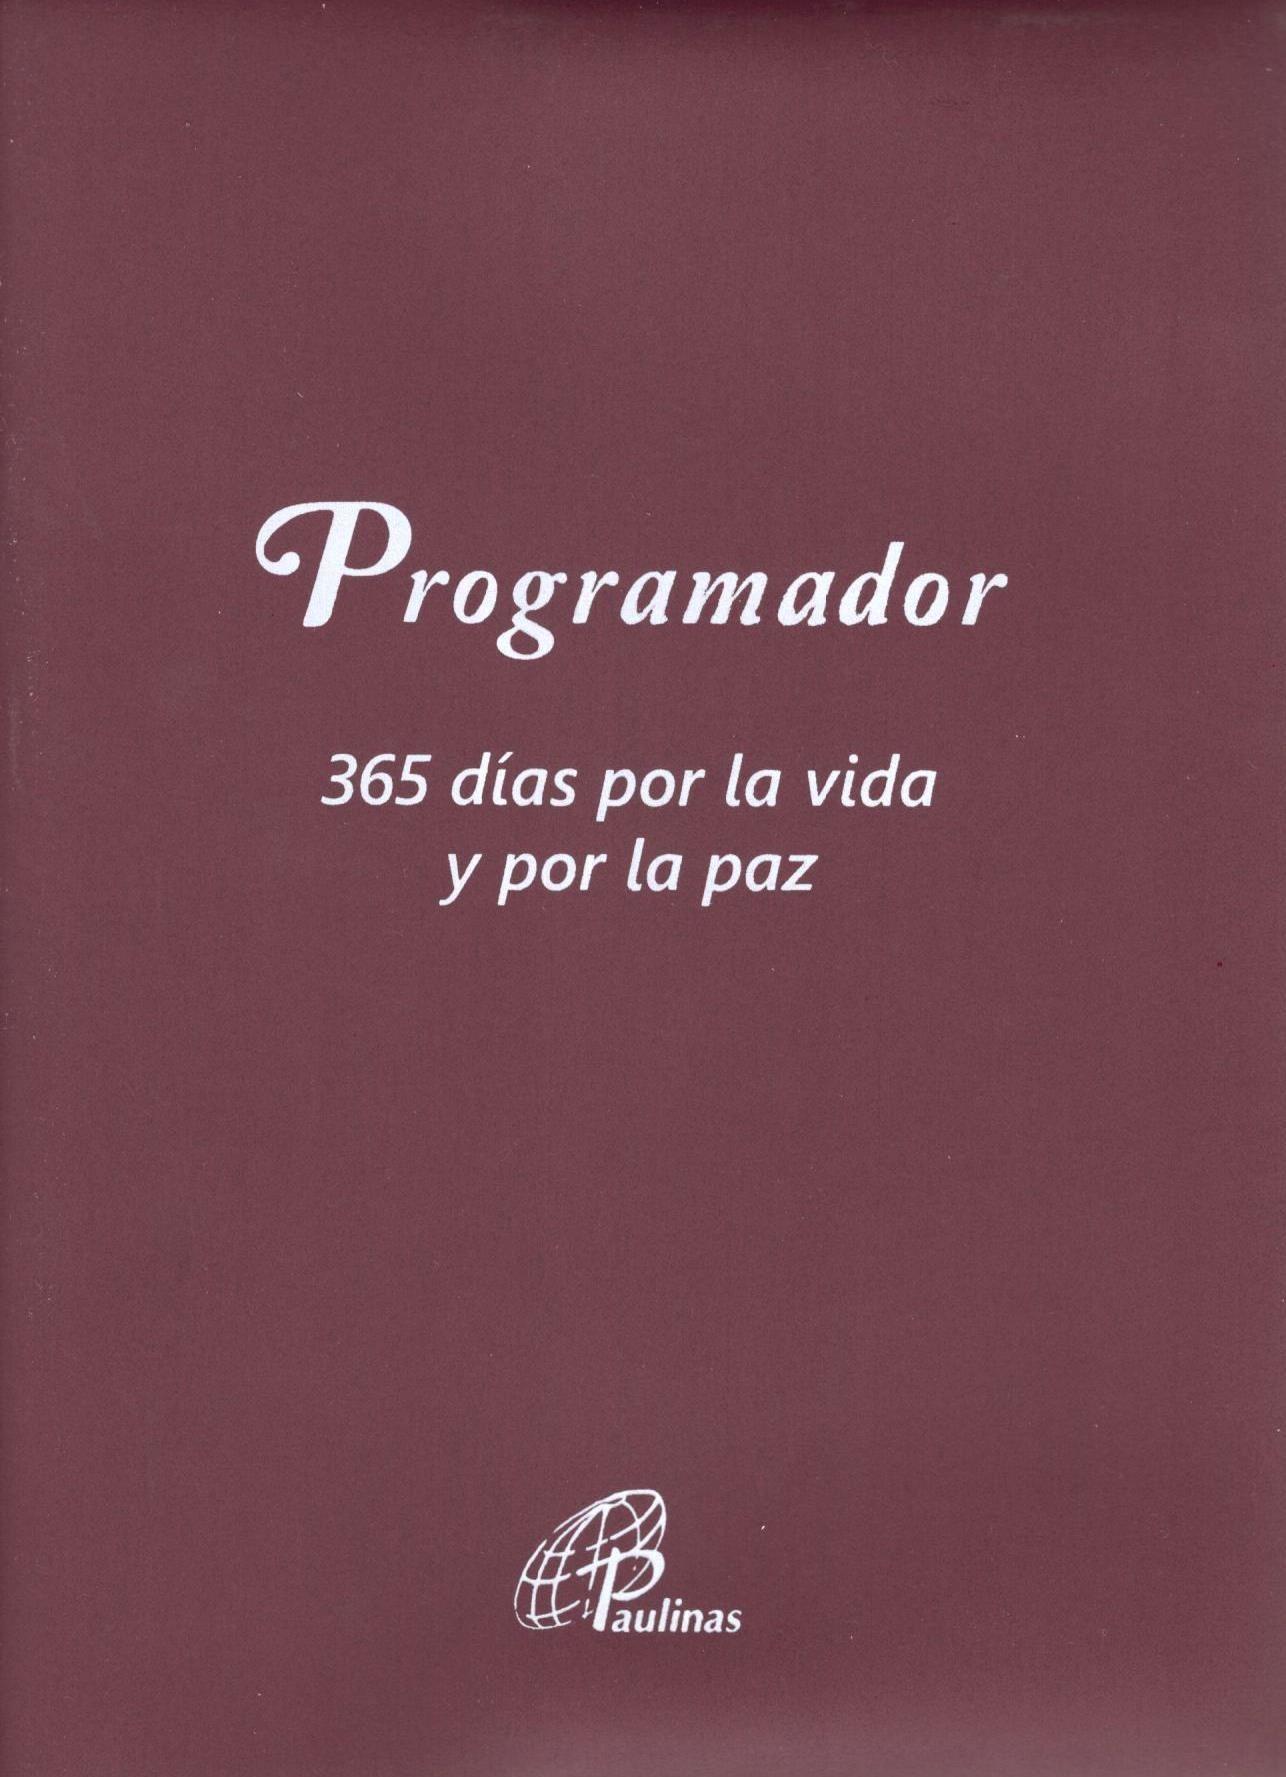 PROGRAMADOR 2019 365 DIAS POR LA VIDA Y POR LA PAZ